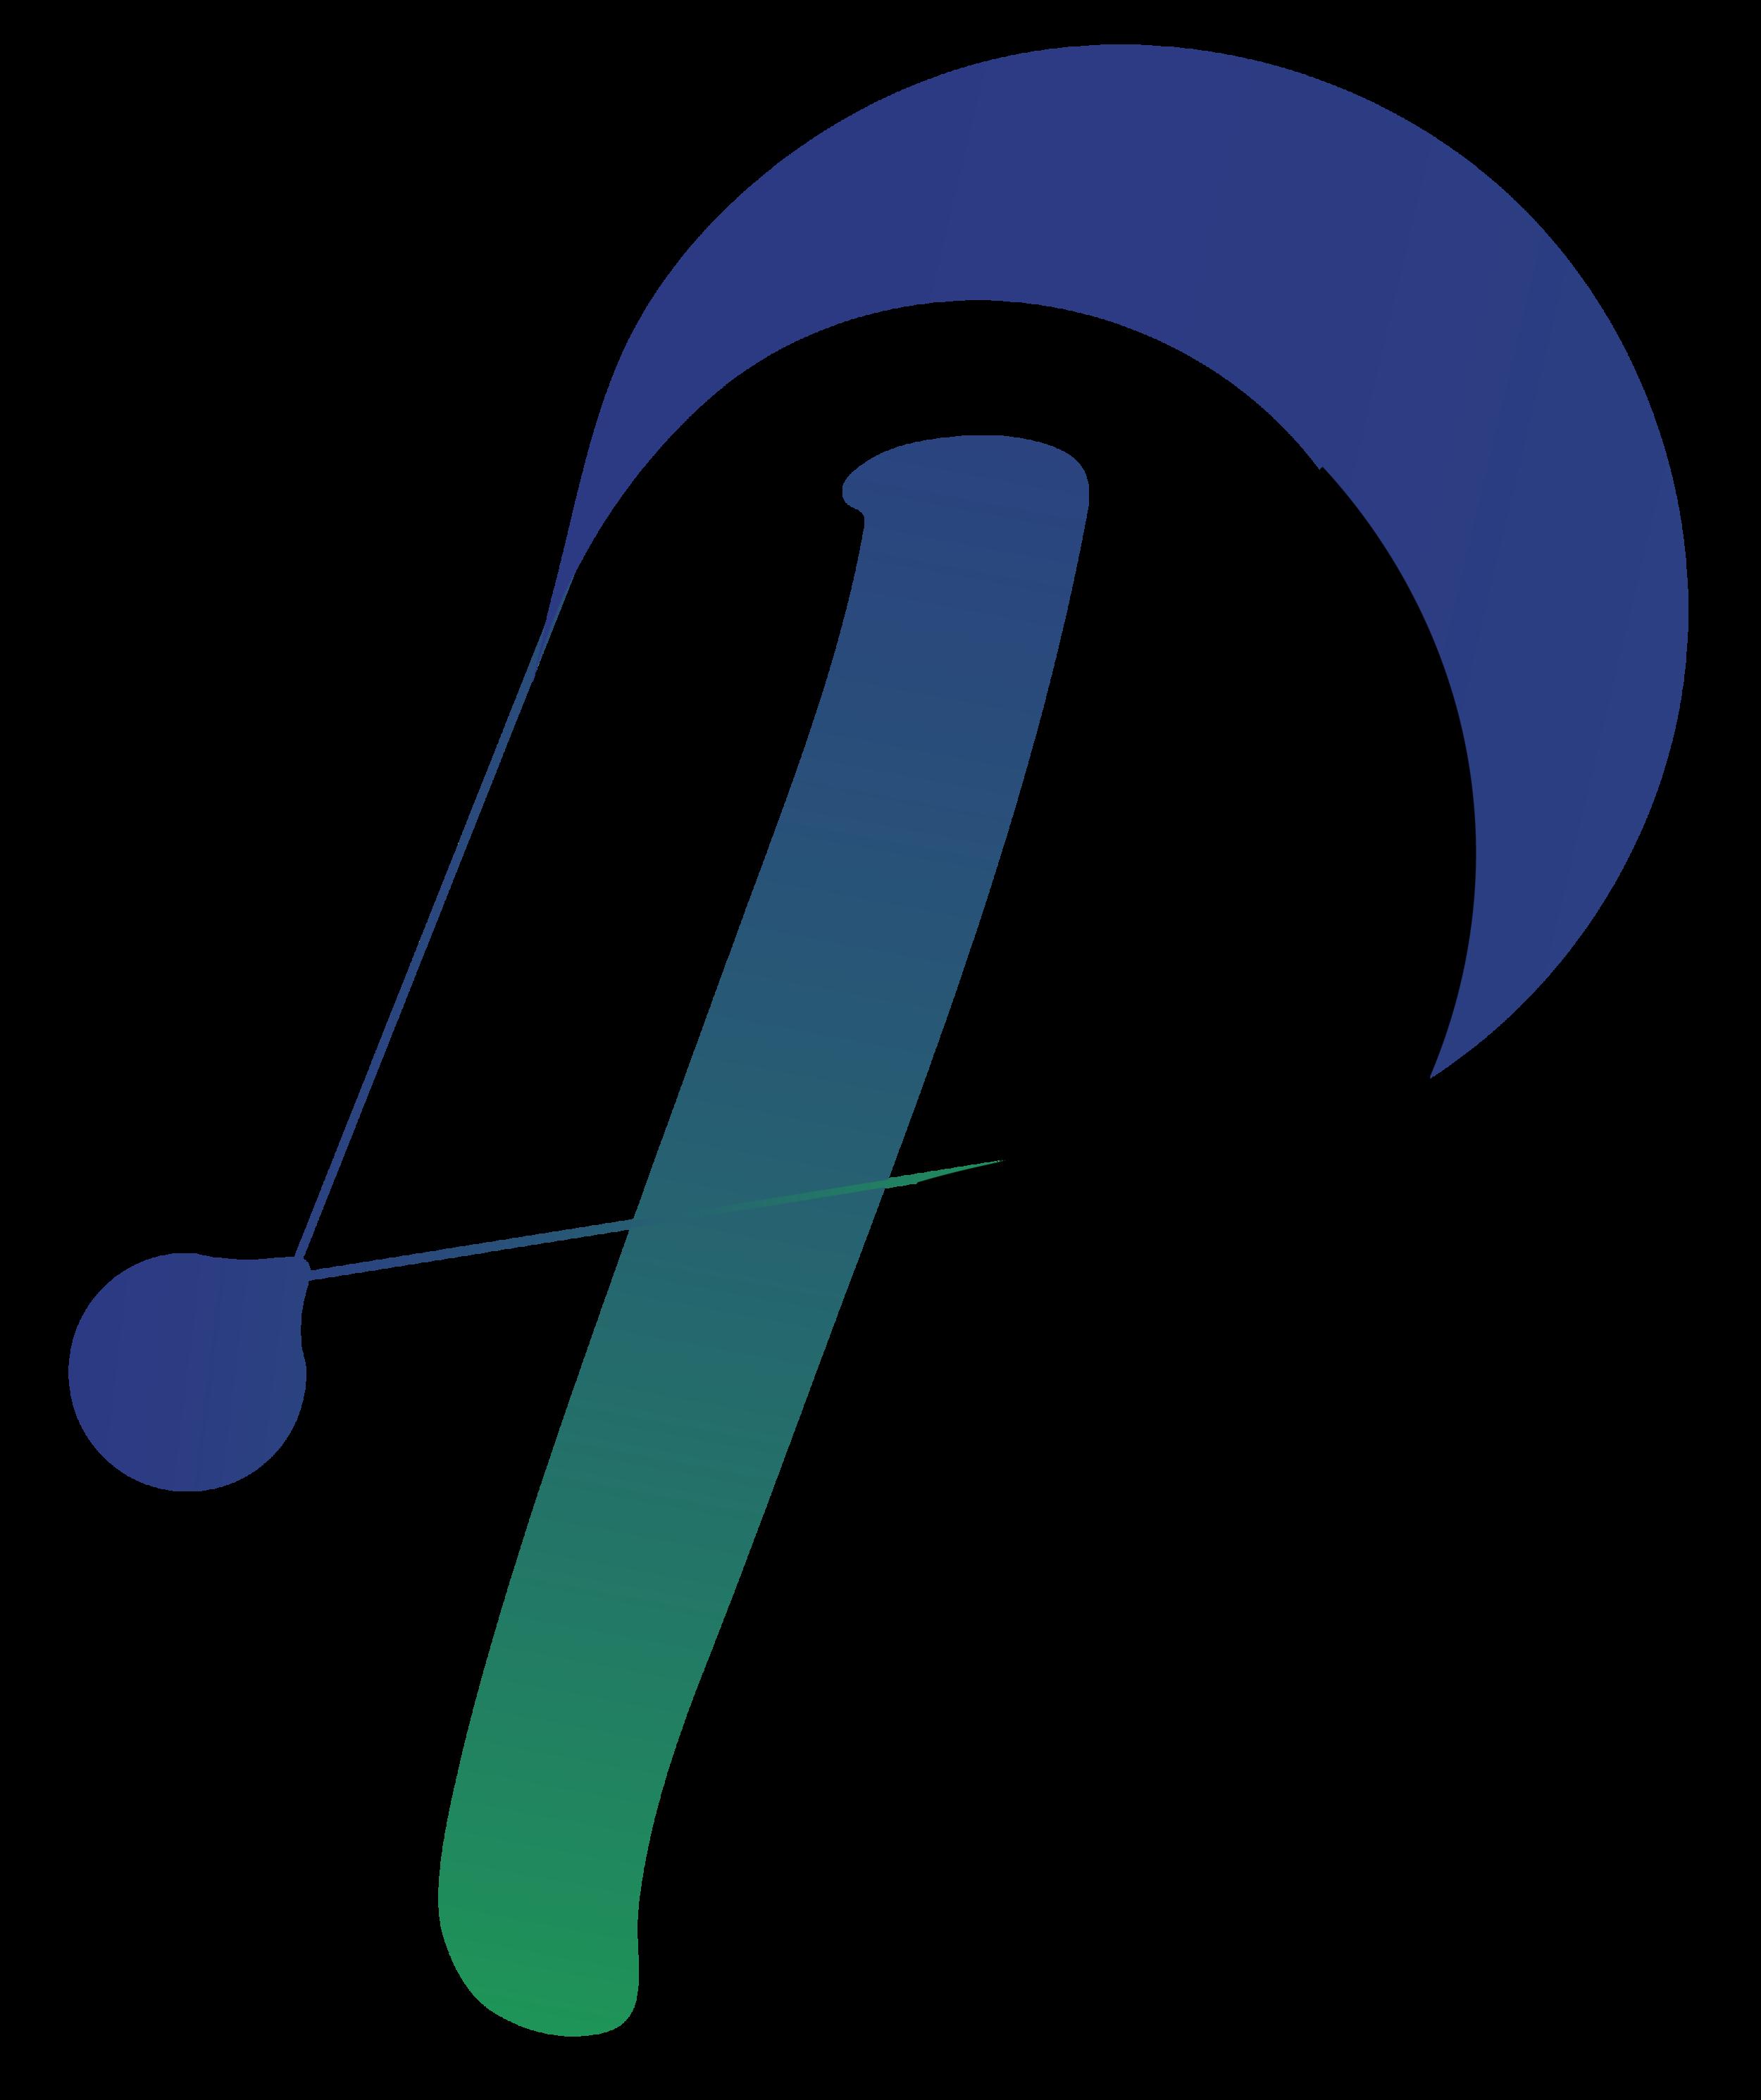 ParachuteS_logo_P-02.png